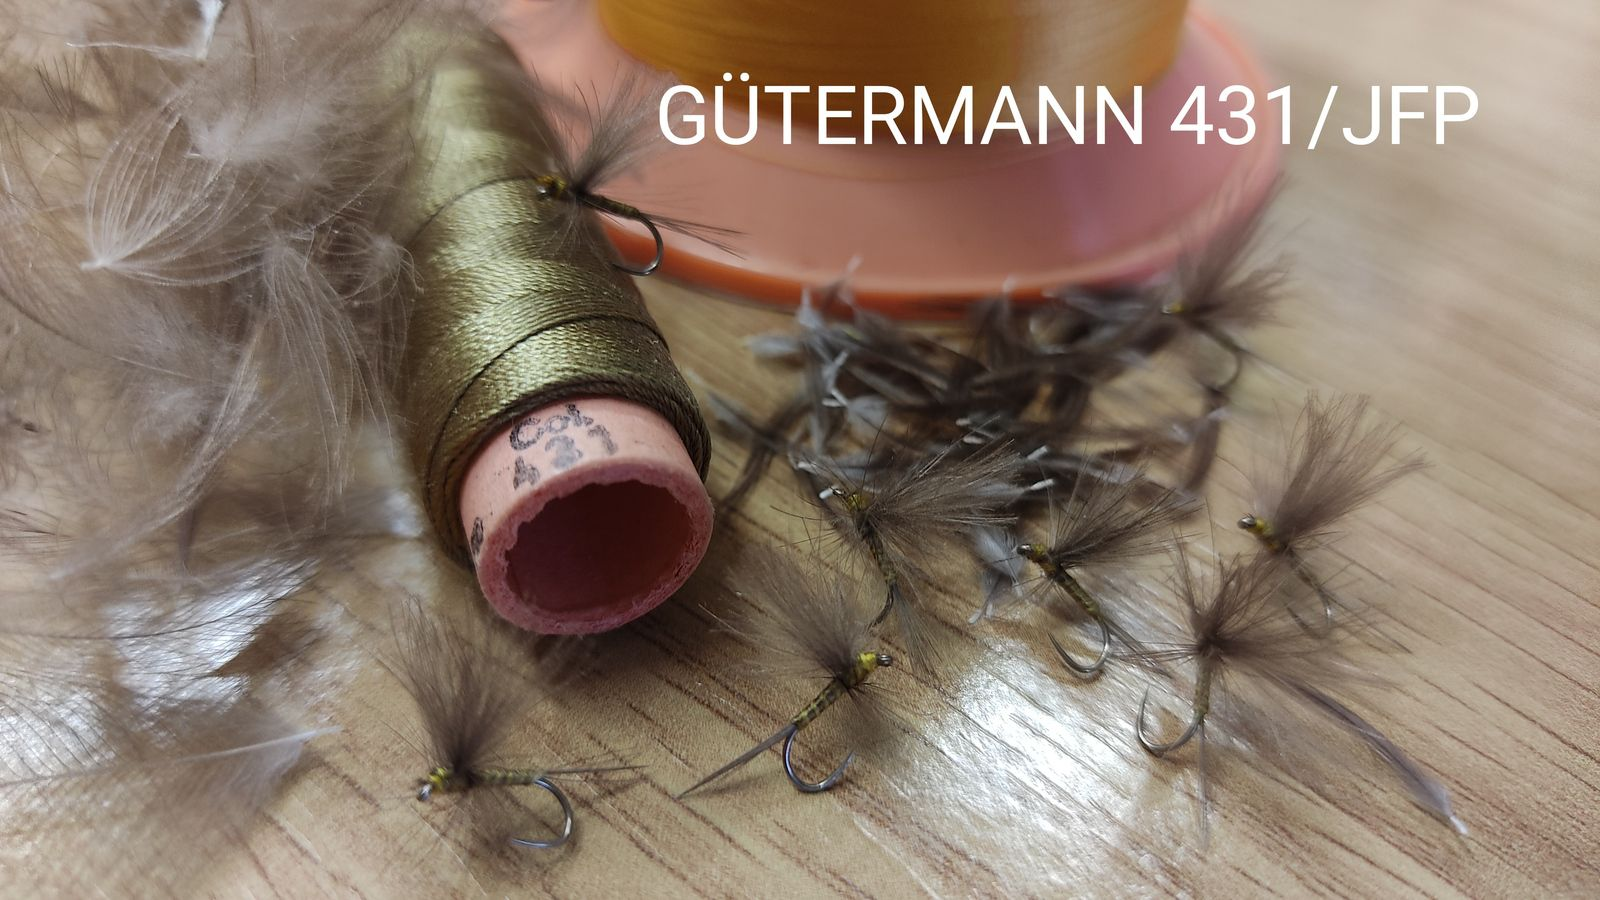 GÜTERMANN 431/JFP